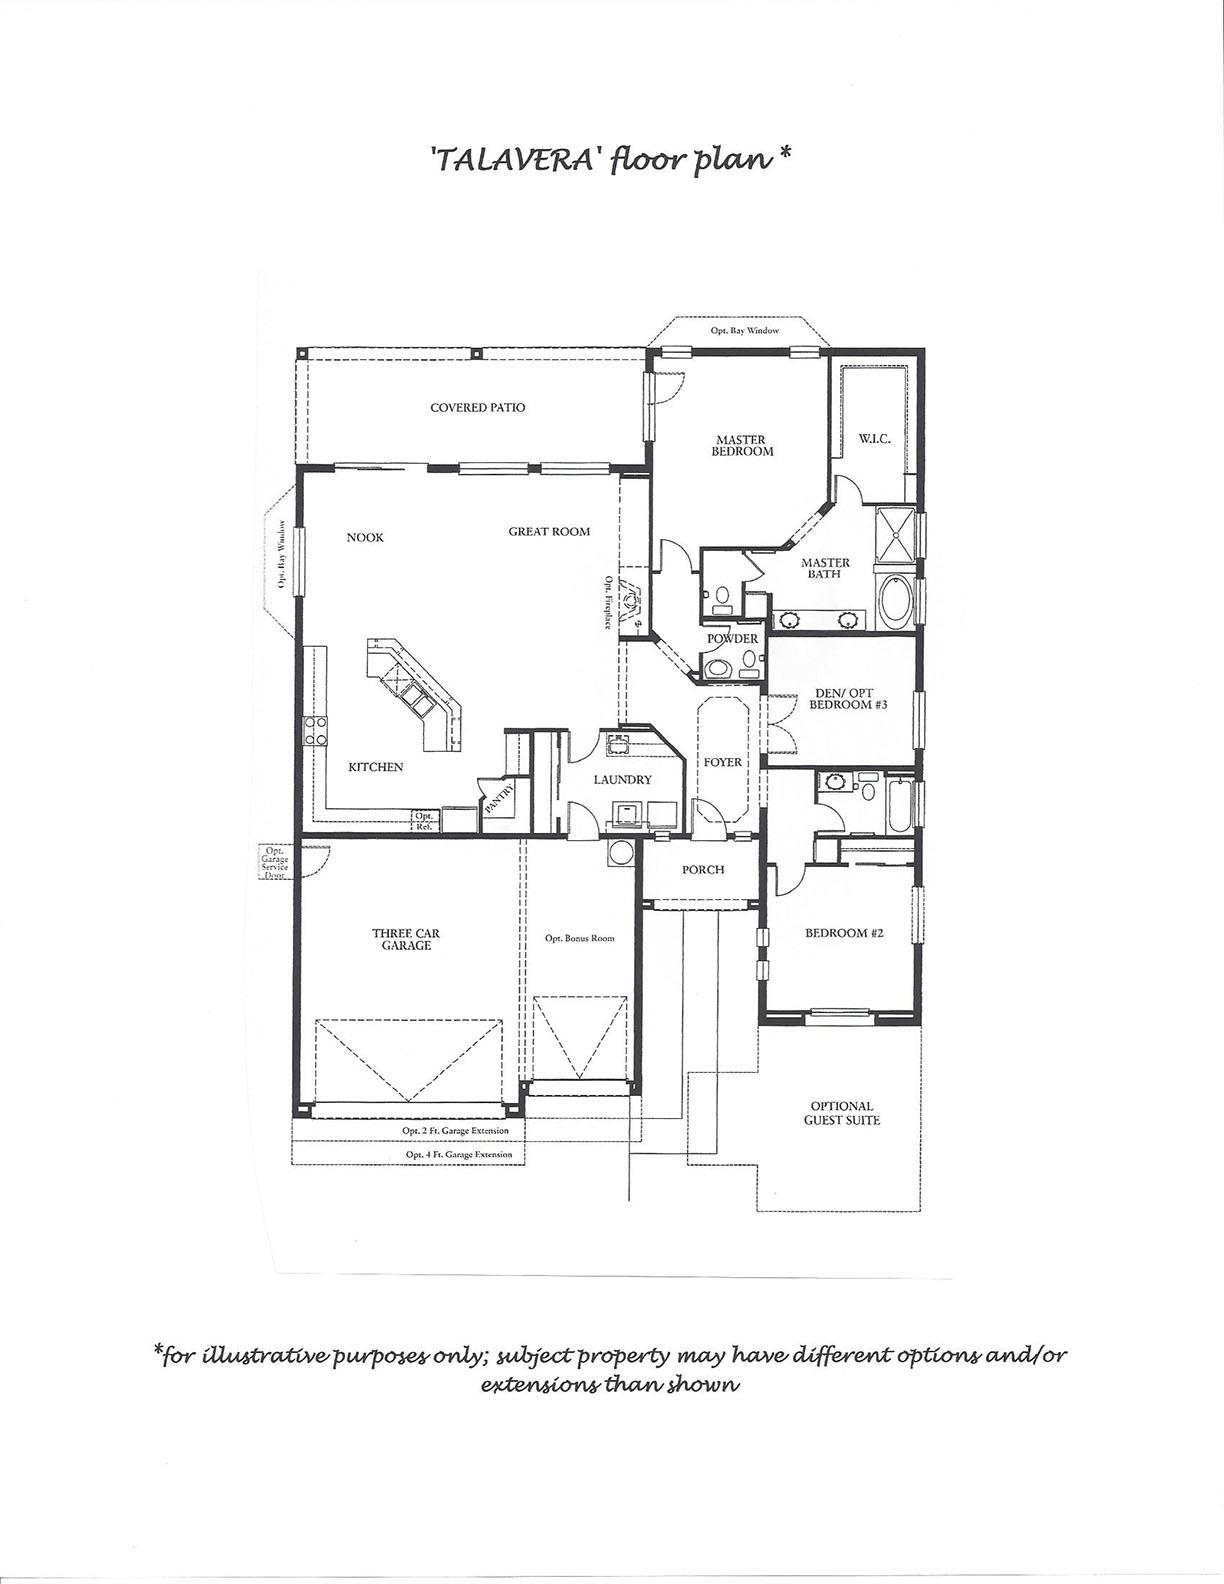 Pebblecreek Real Estate Floor Plan Talavera